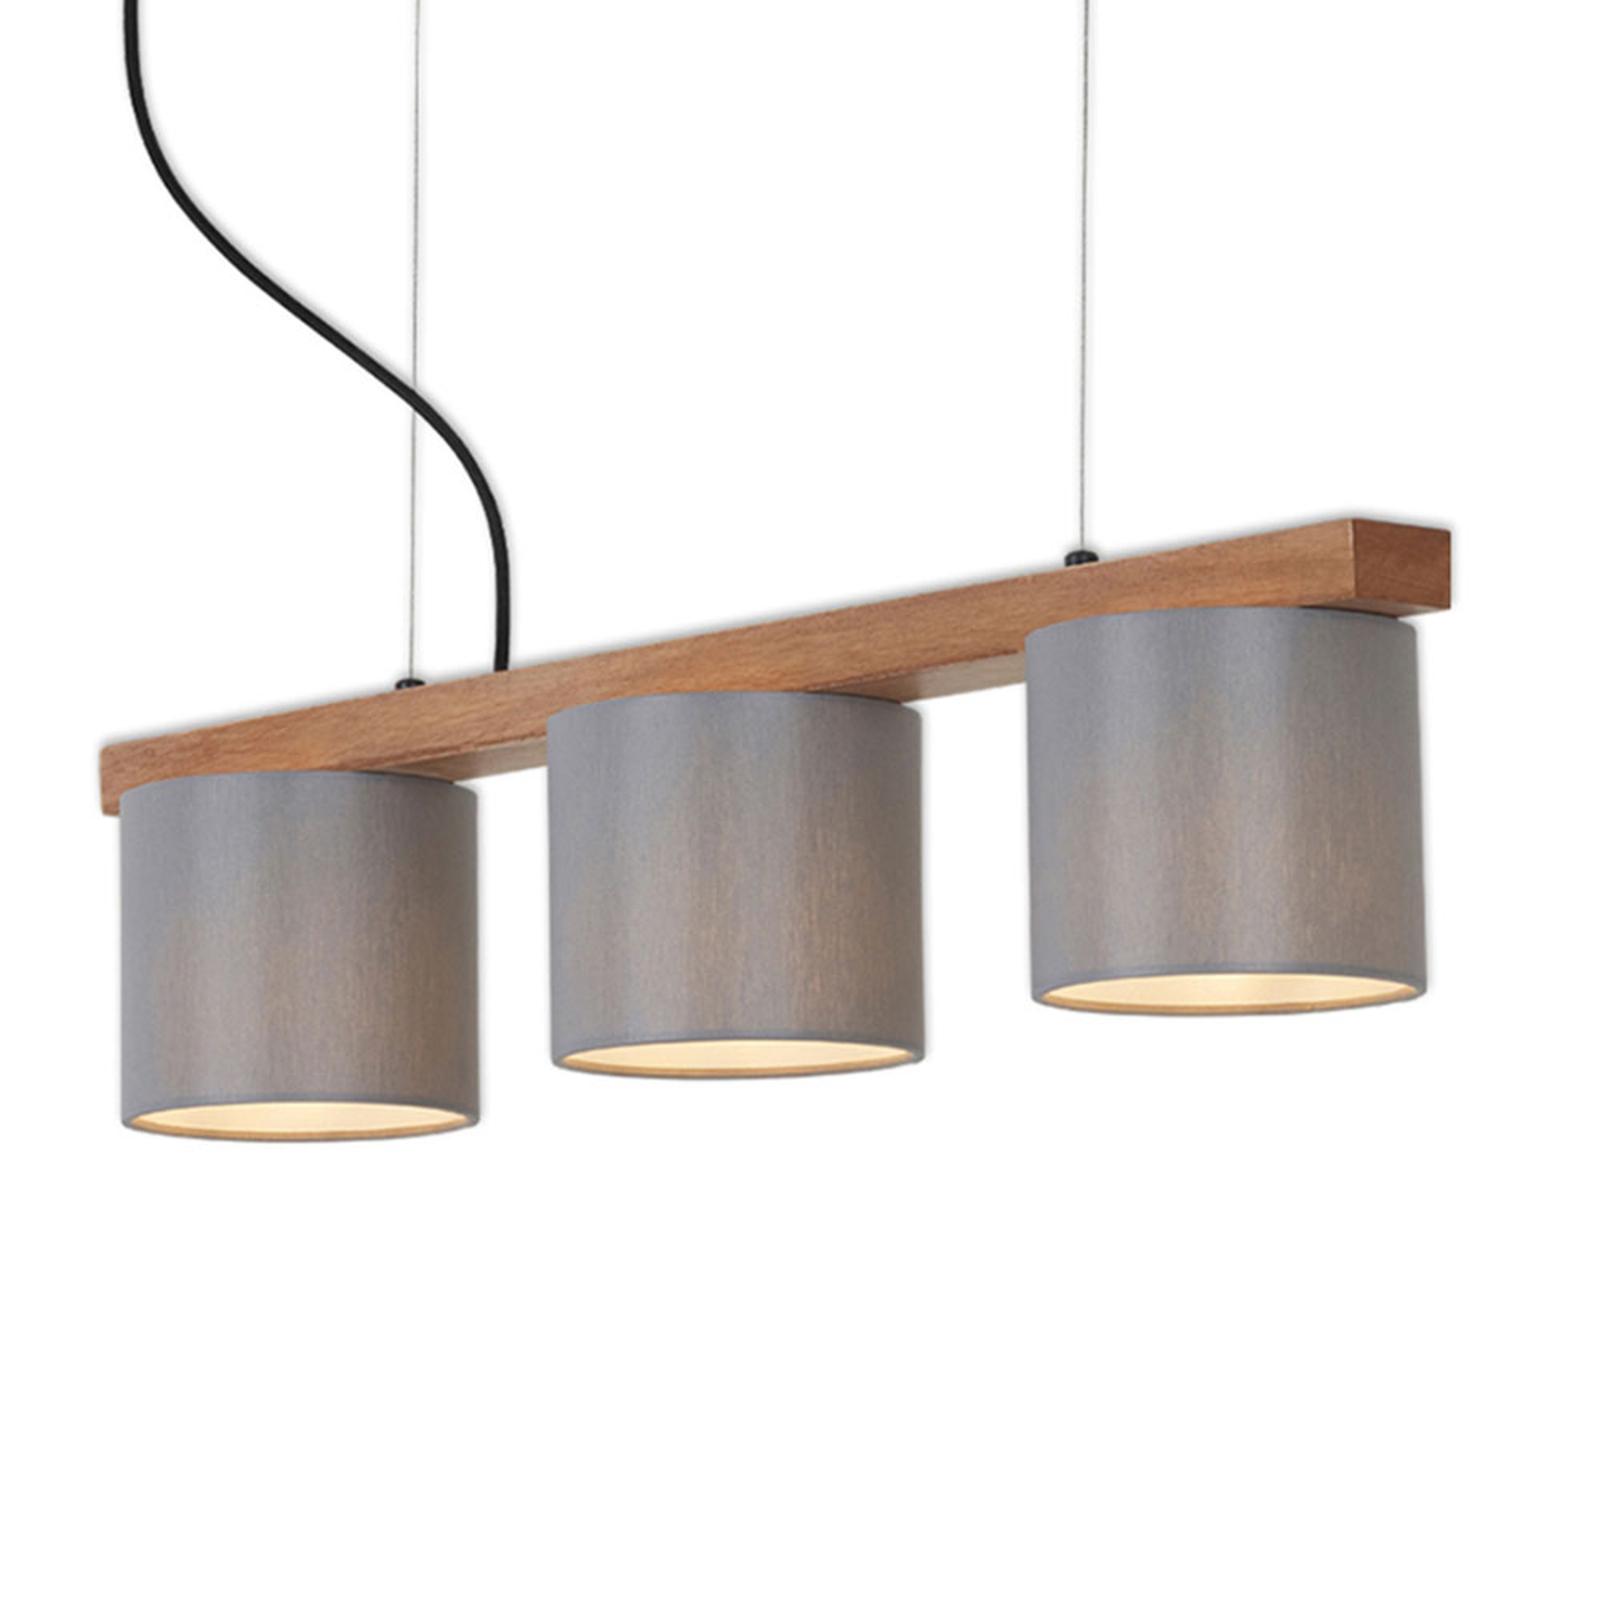 Pendellampe Wood & Style 4075, dreiflammig